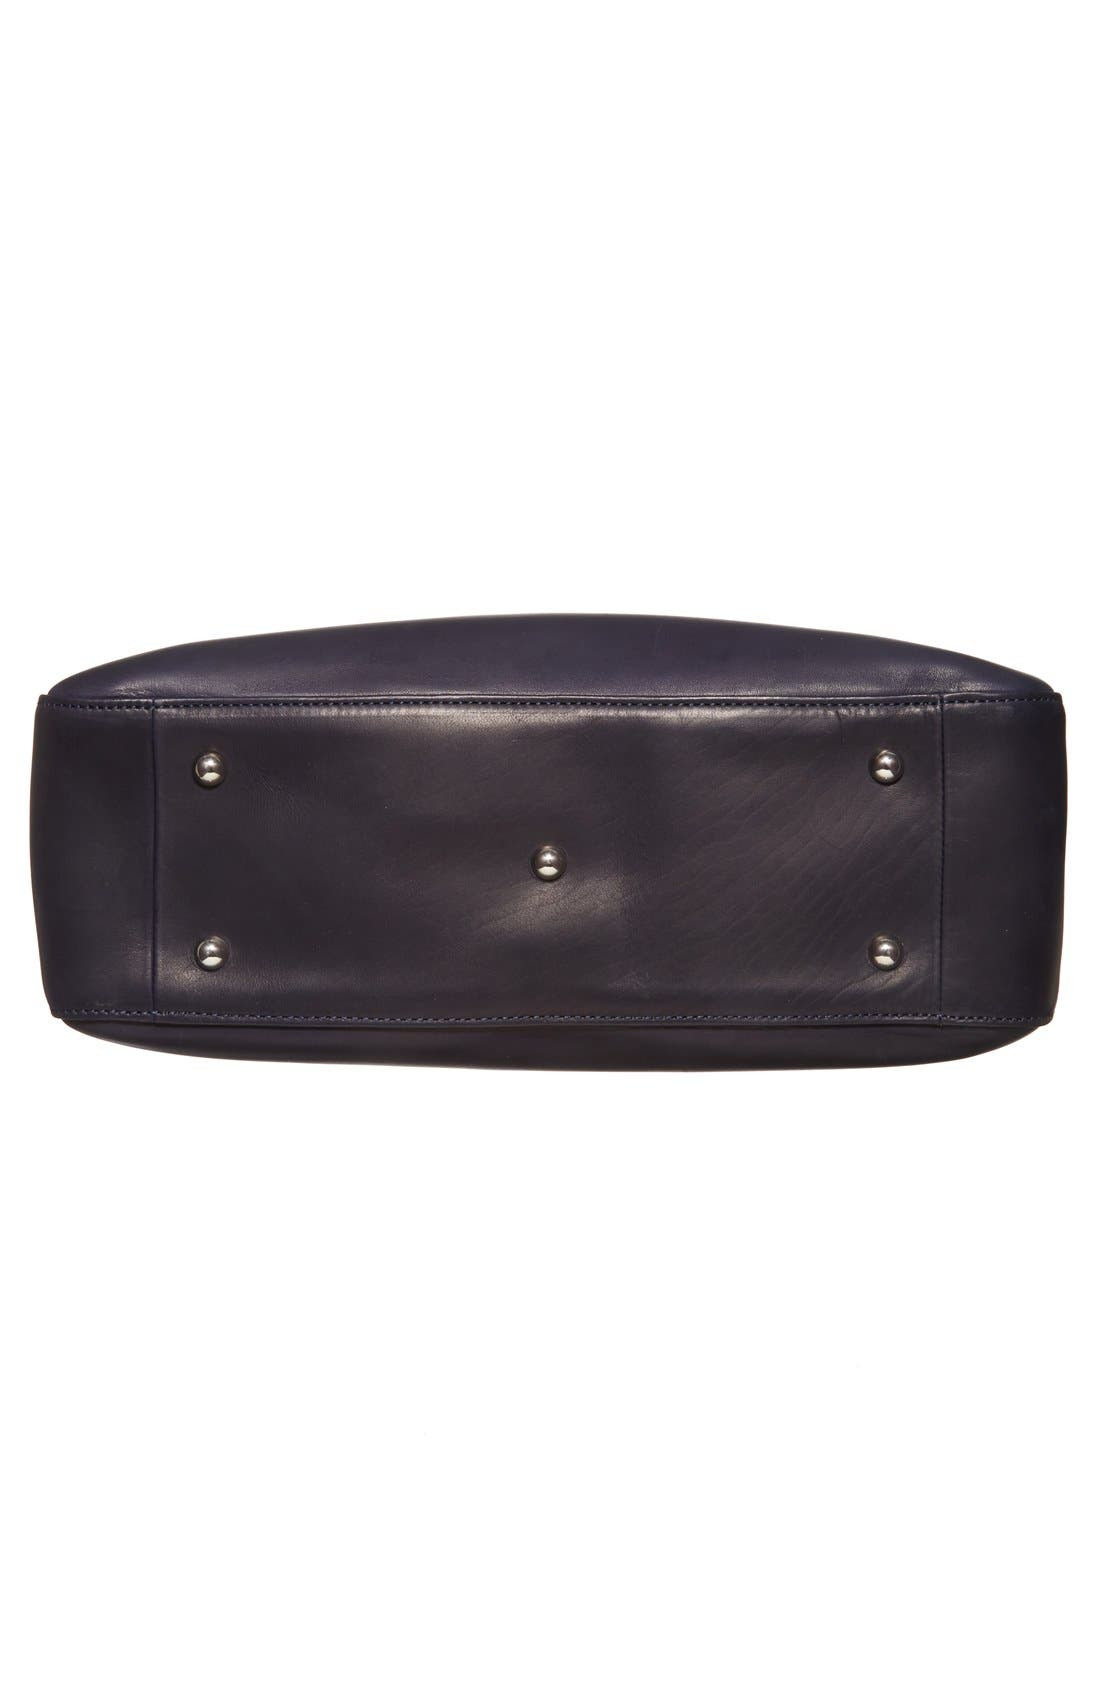 LONGCHAMP,                             'Medium Roseau Heritage' Leather Tote,                             Alternate thumbnail 6, color,                             400